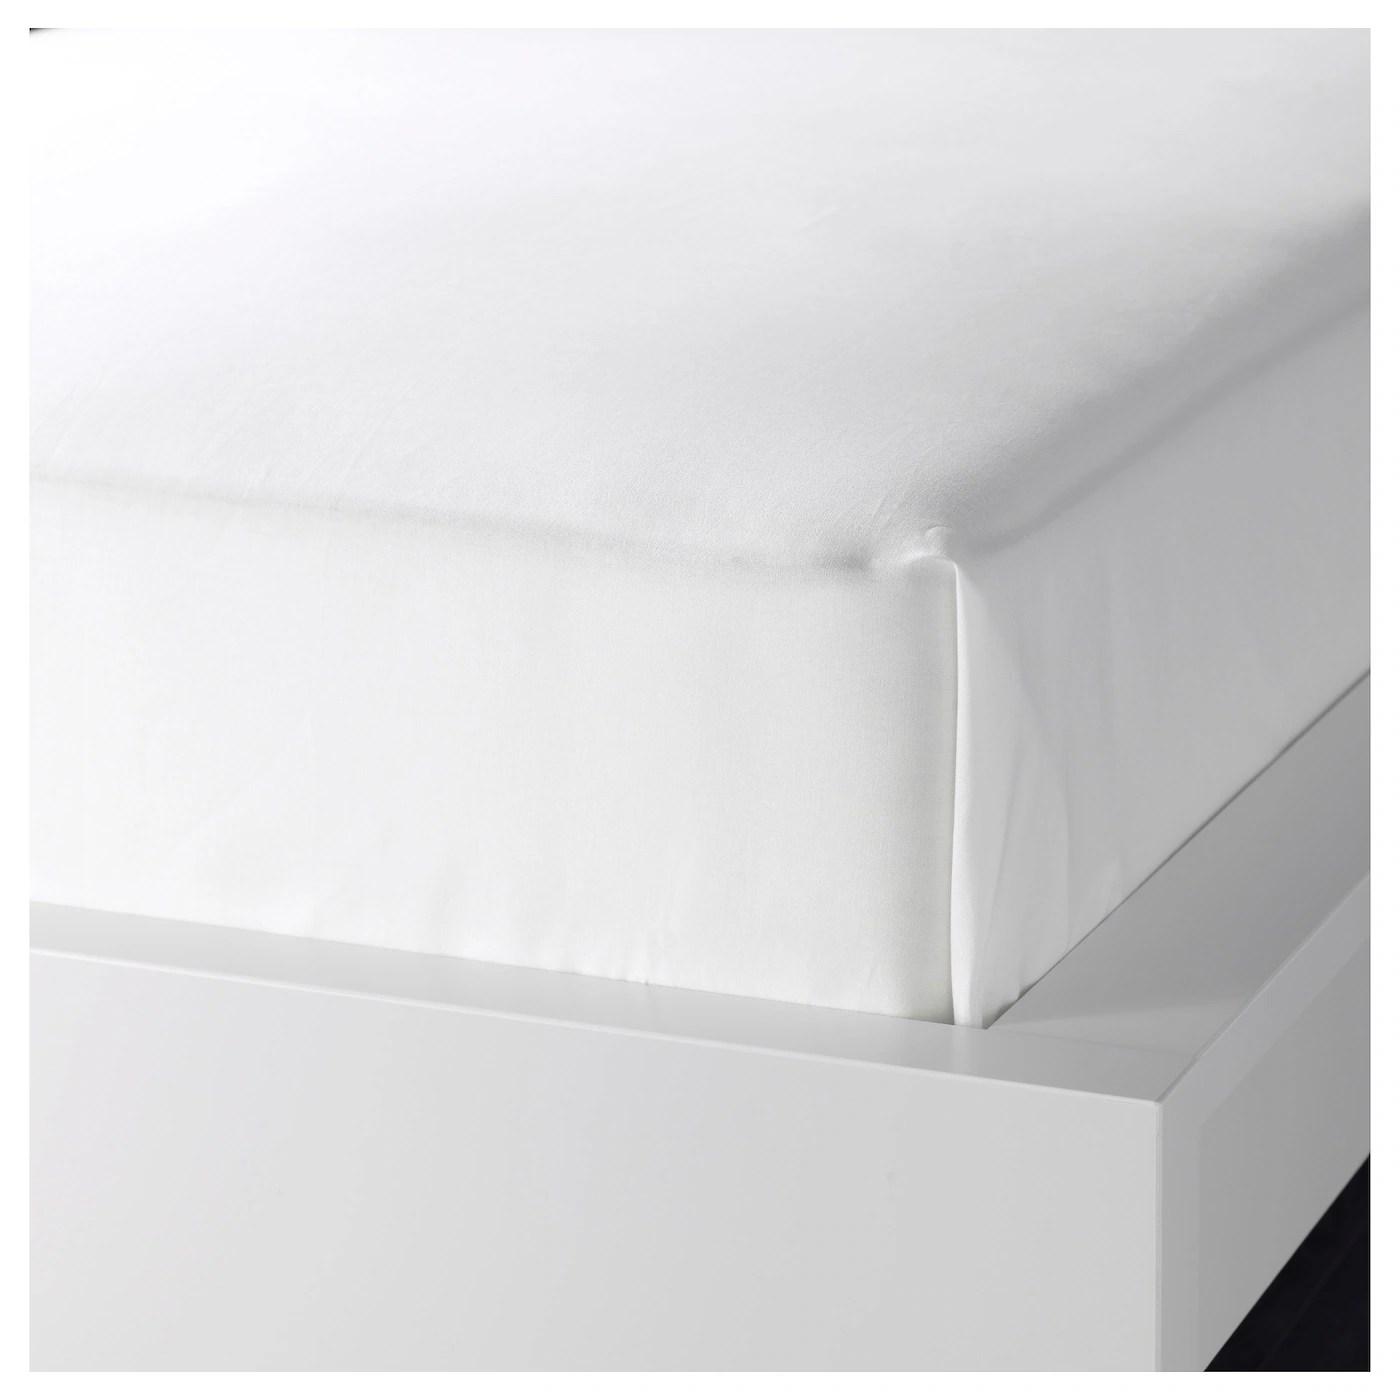 Dvala Drap Blanc 240x260 Cm Materiau Durable Ikea